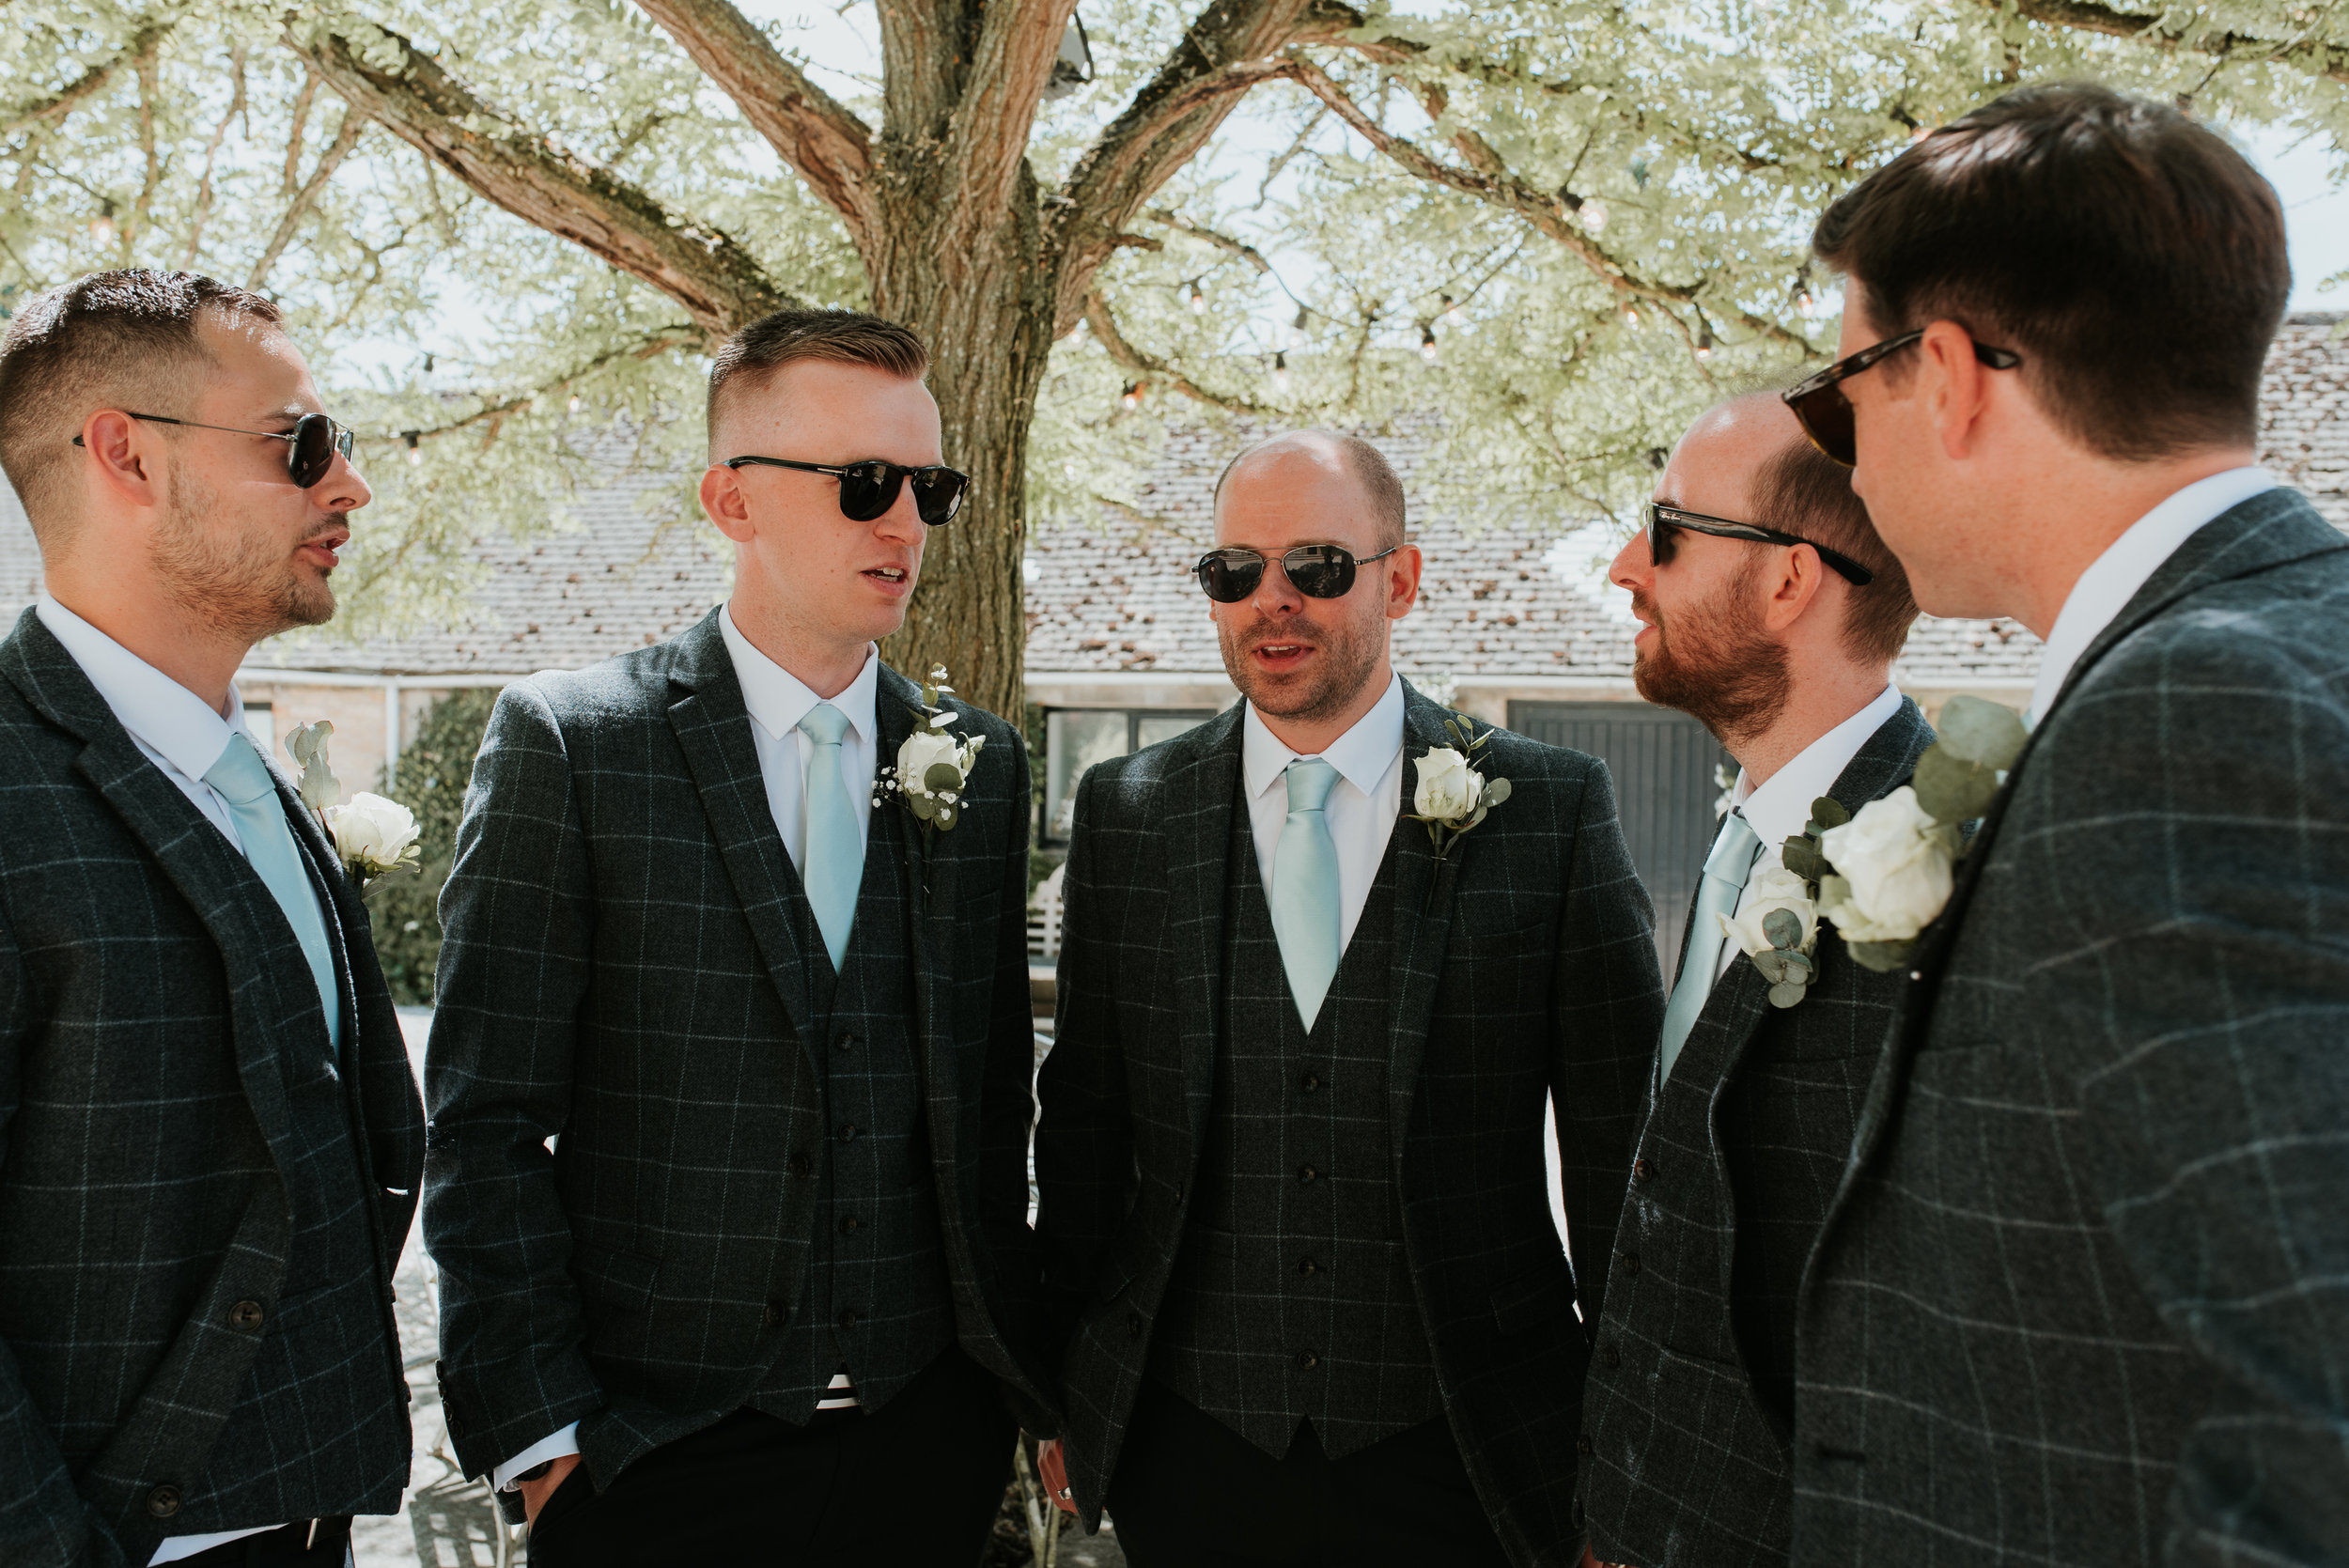 Oxfordshire-wedding-photographer-23.jpg